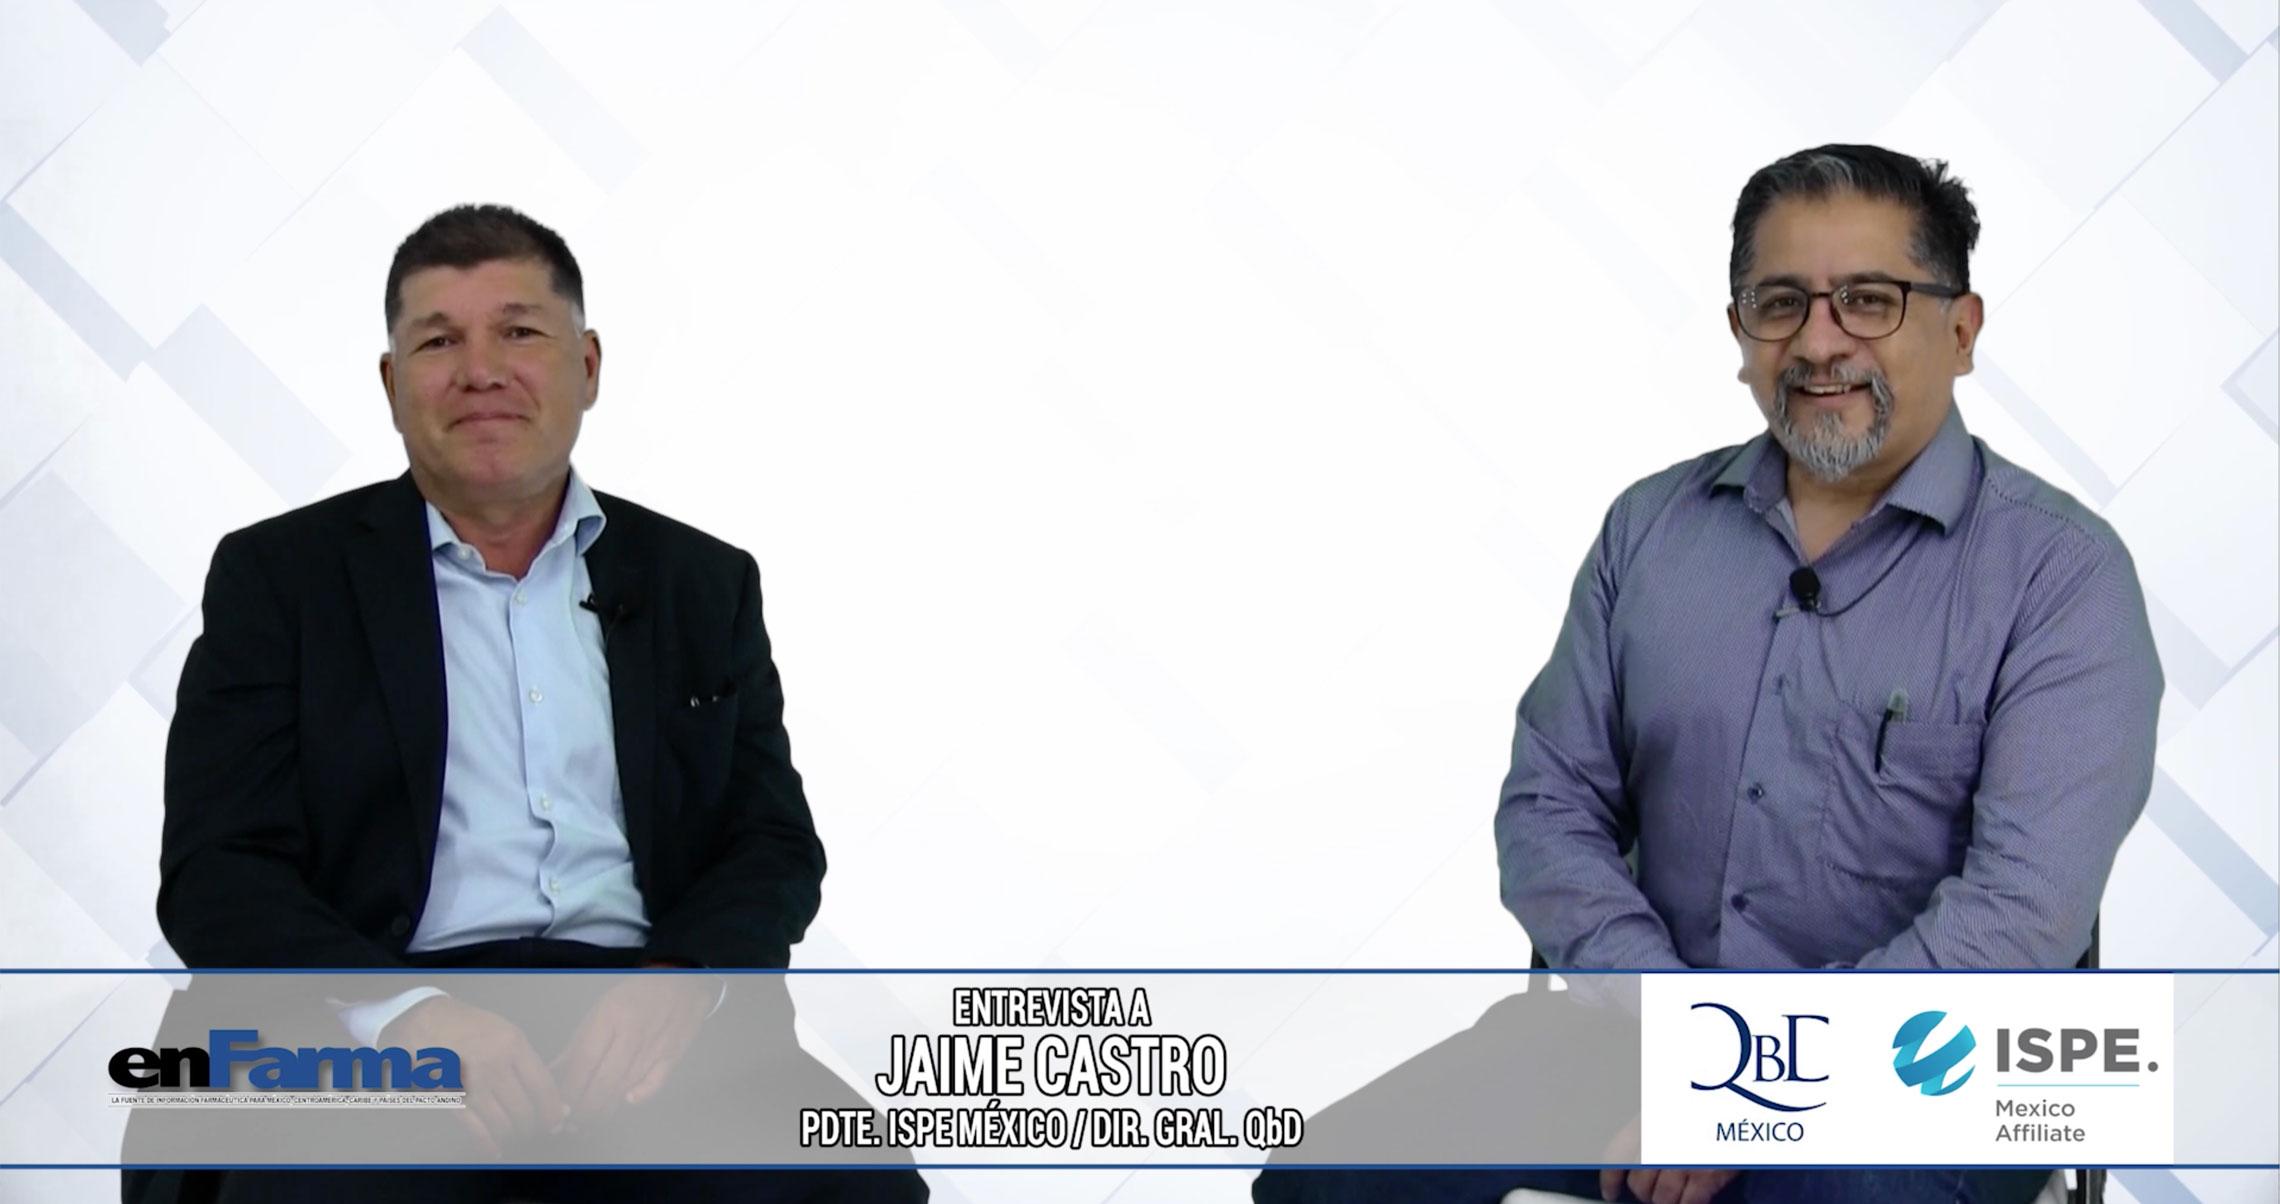 Entrevista a Jaime Castro - Presidente del ISPE Mexico Affiliate